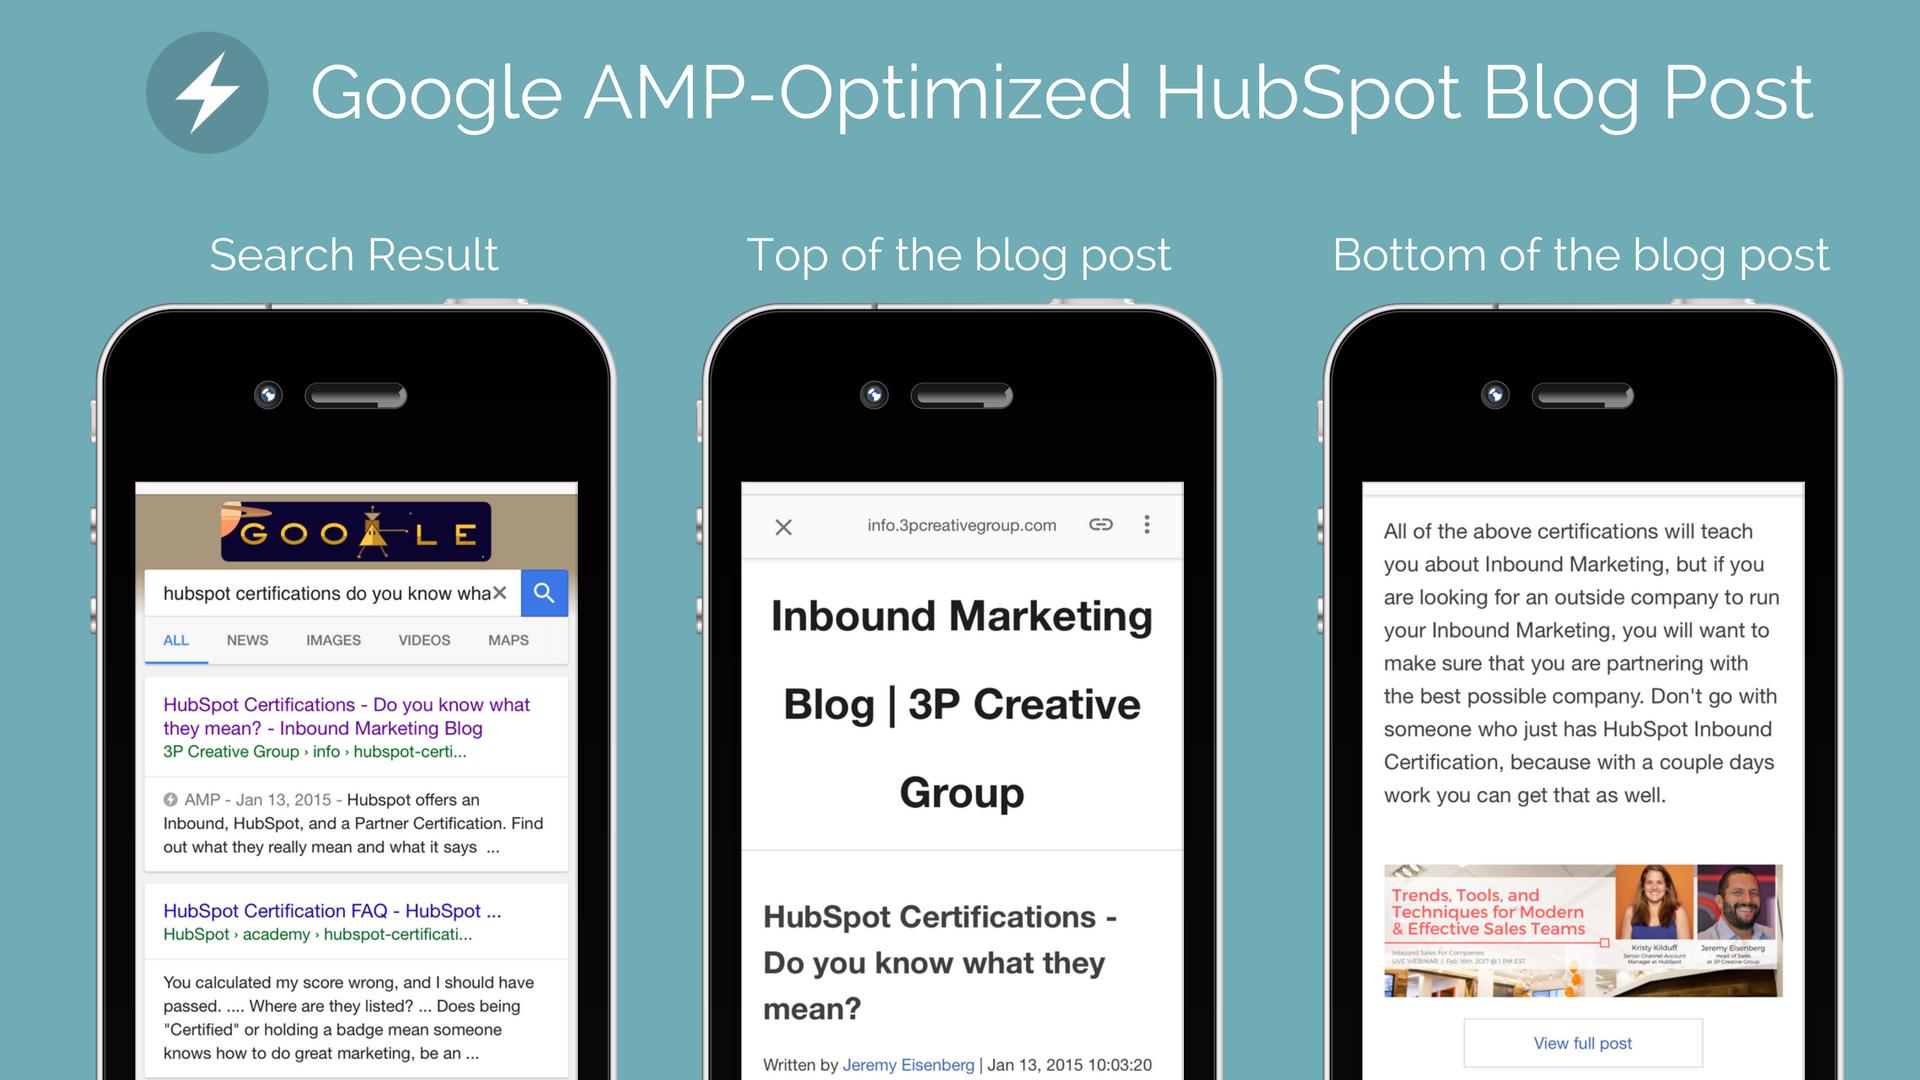 Google AMP-Optimized HubSpot Blog Post.png